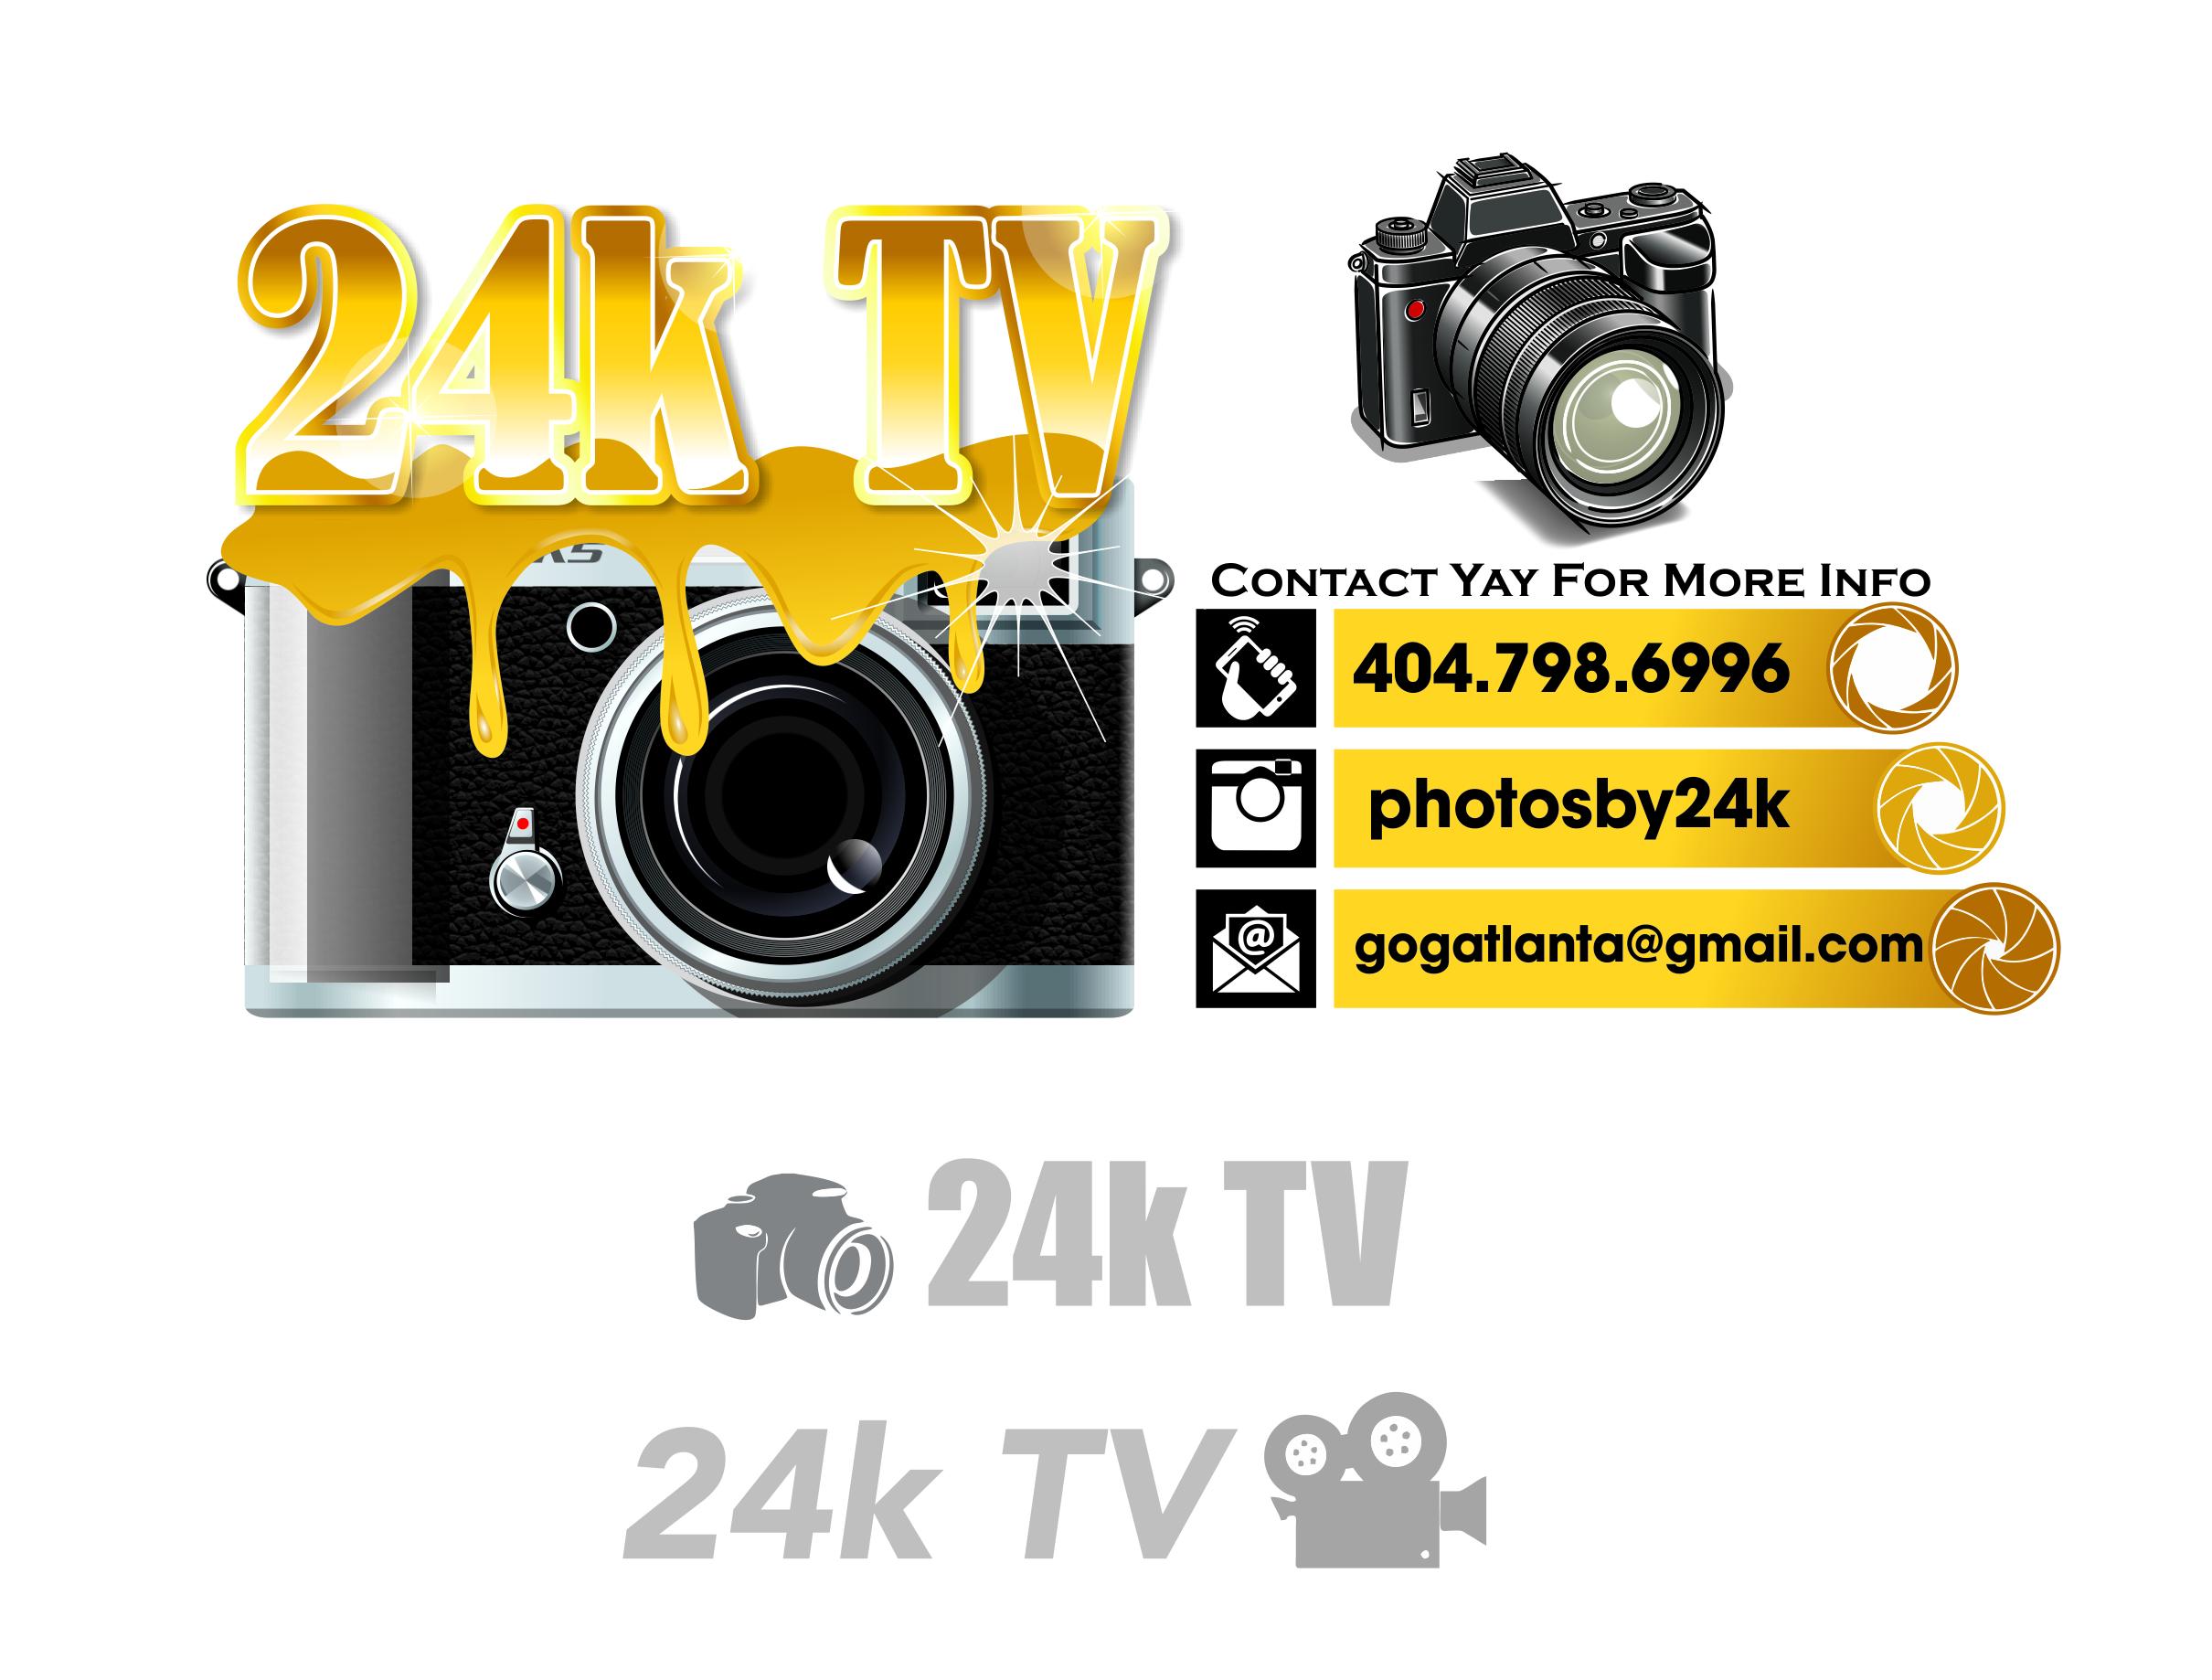 24k tv logo